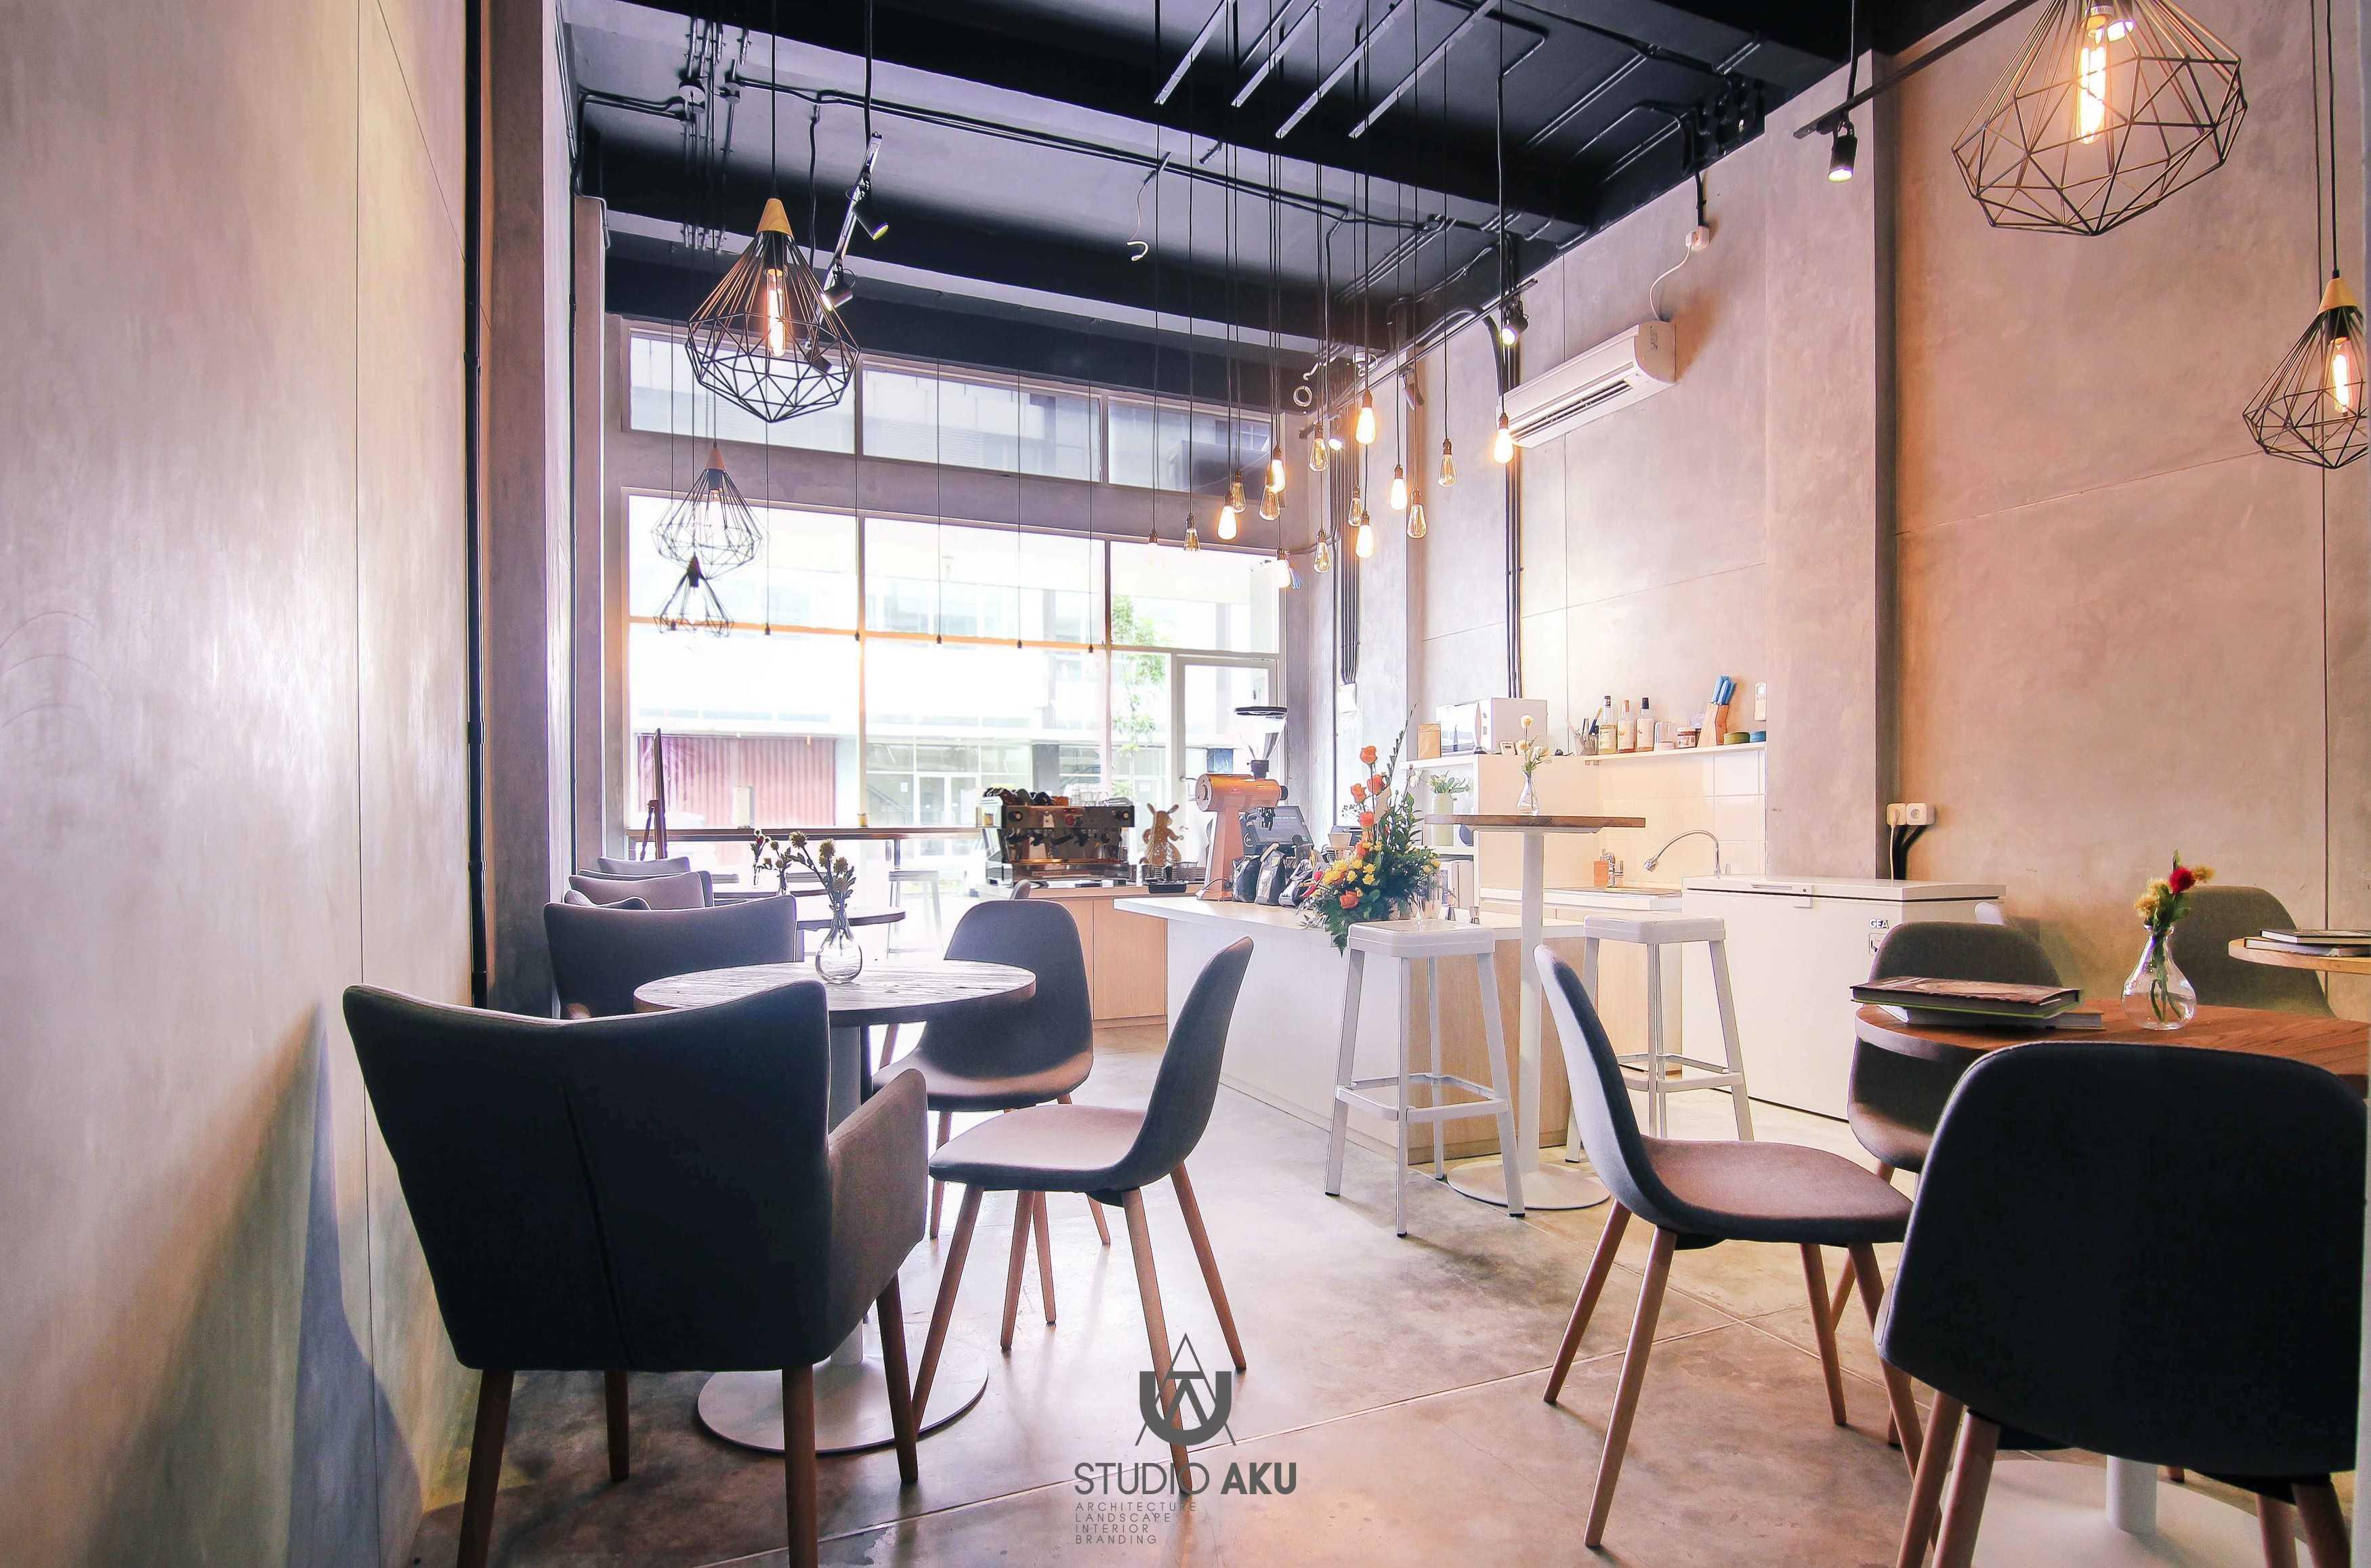 Studio Aku Spotten Alam Sutera, Ruko Prominence Alam Sutera, Ruko Prominence Dining Area Minimalis,modern,kontemporer,skandinavia  9319